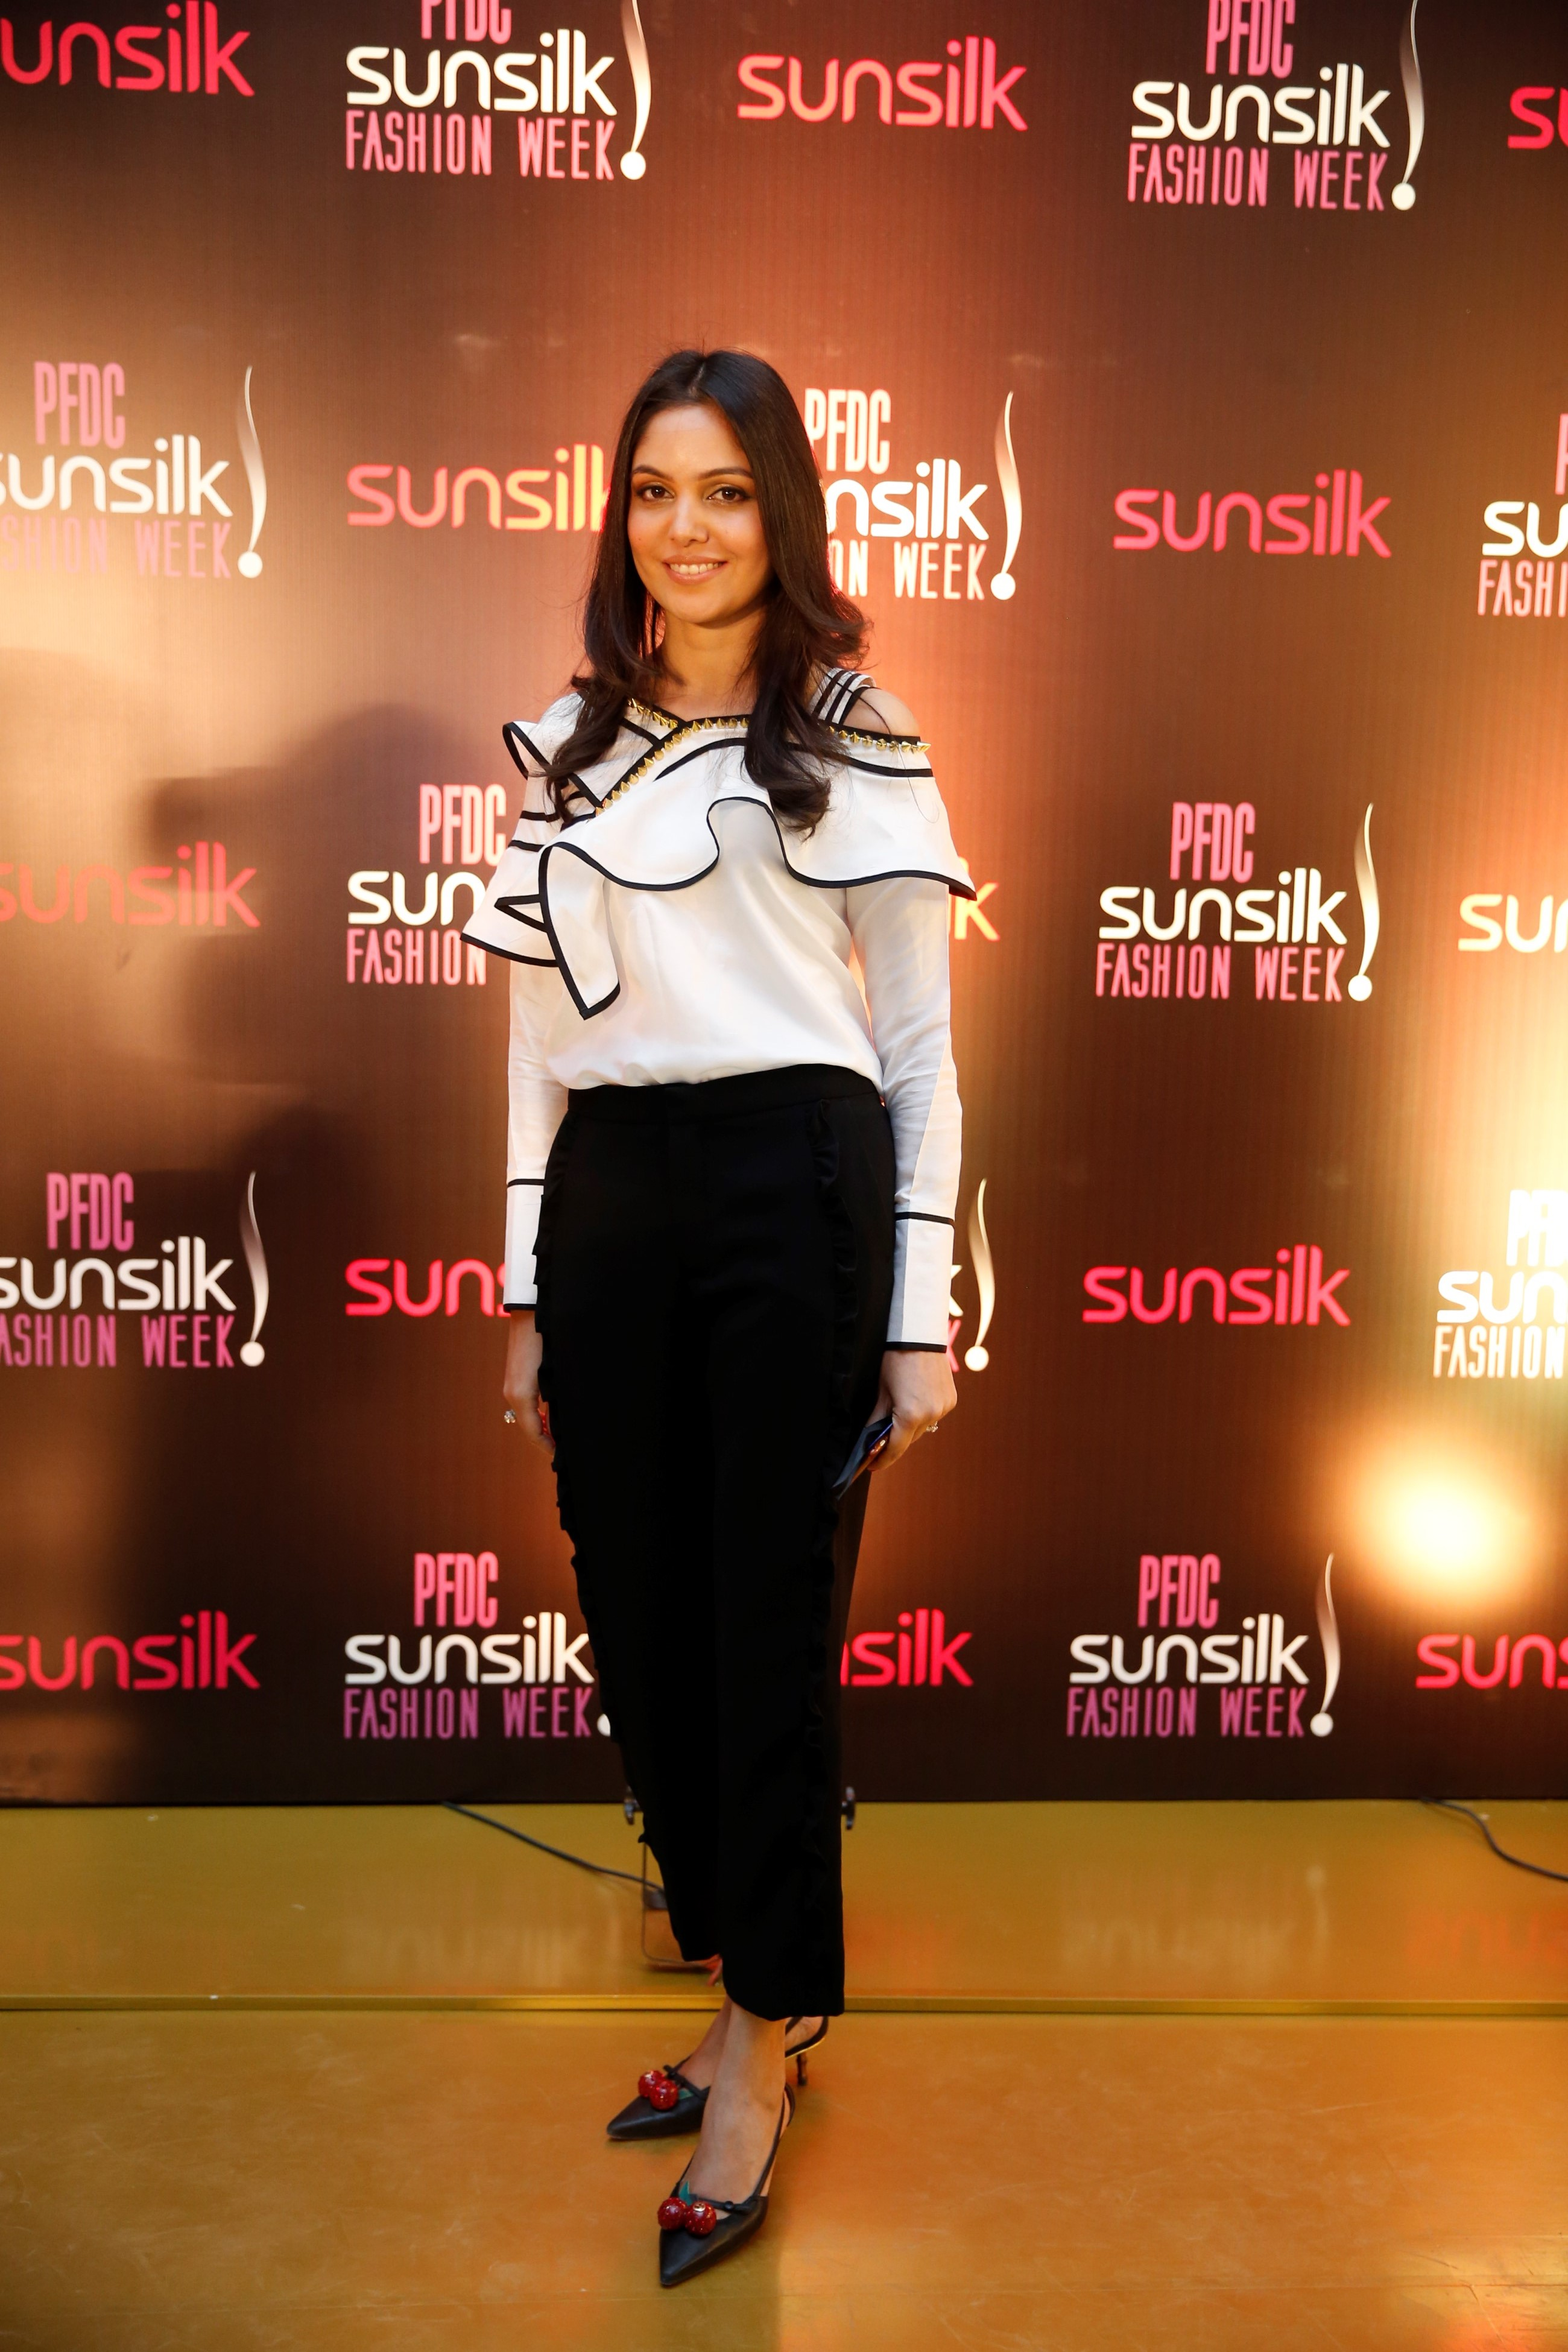 PFDC Sunsilk Fashion Week - Day One & Day Two